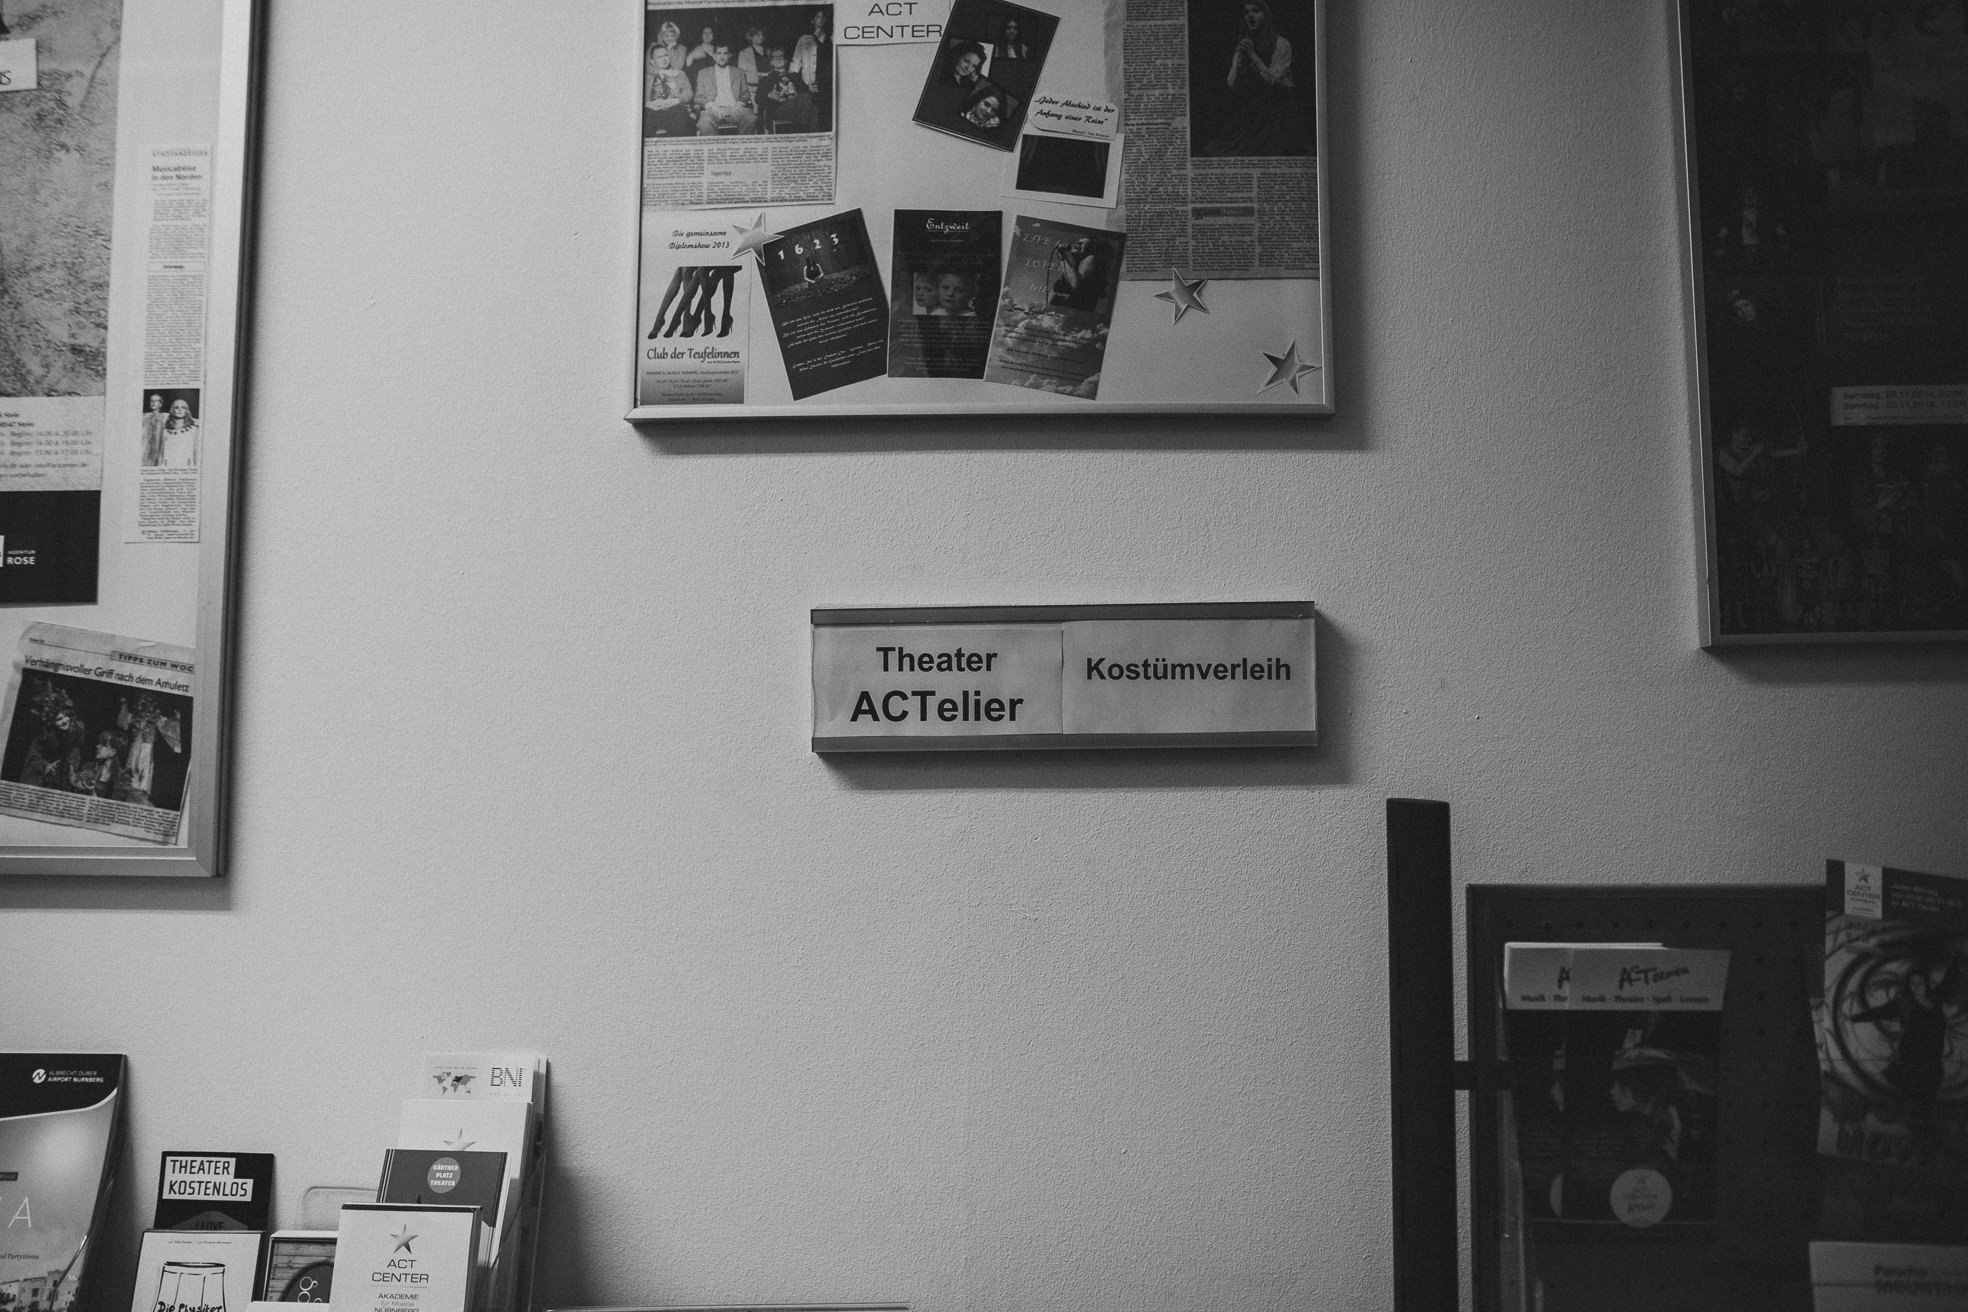 0006ACT-Theater-Nuernberg-Kostuemverleih-IM3C9479